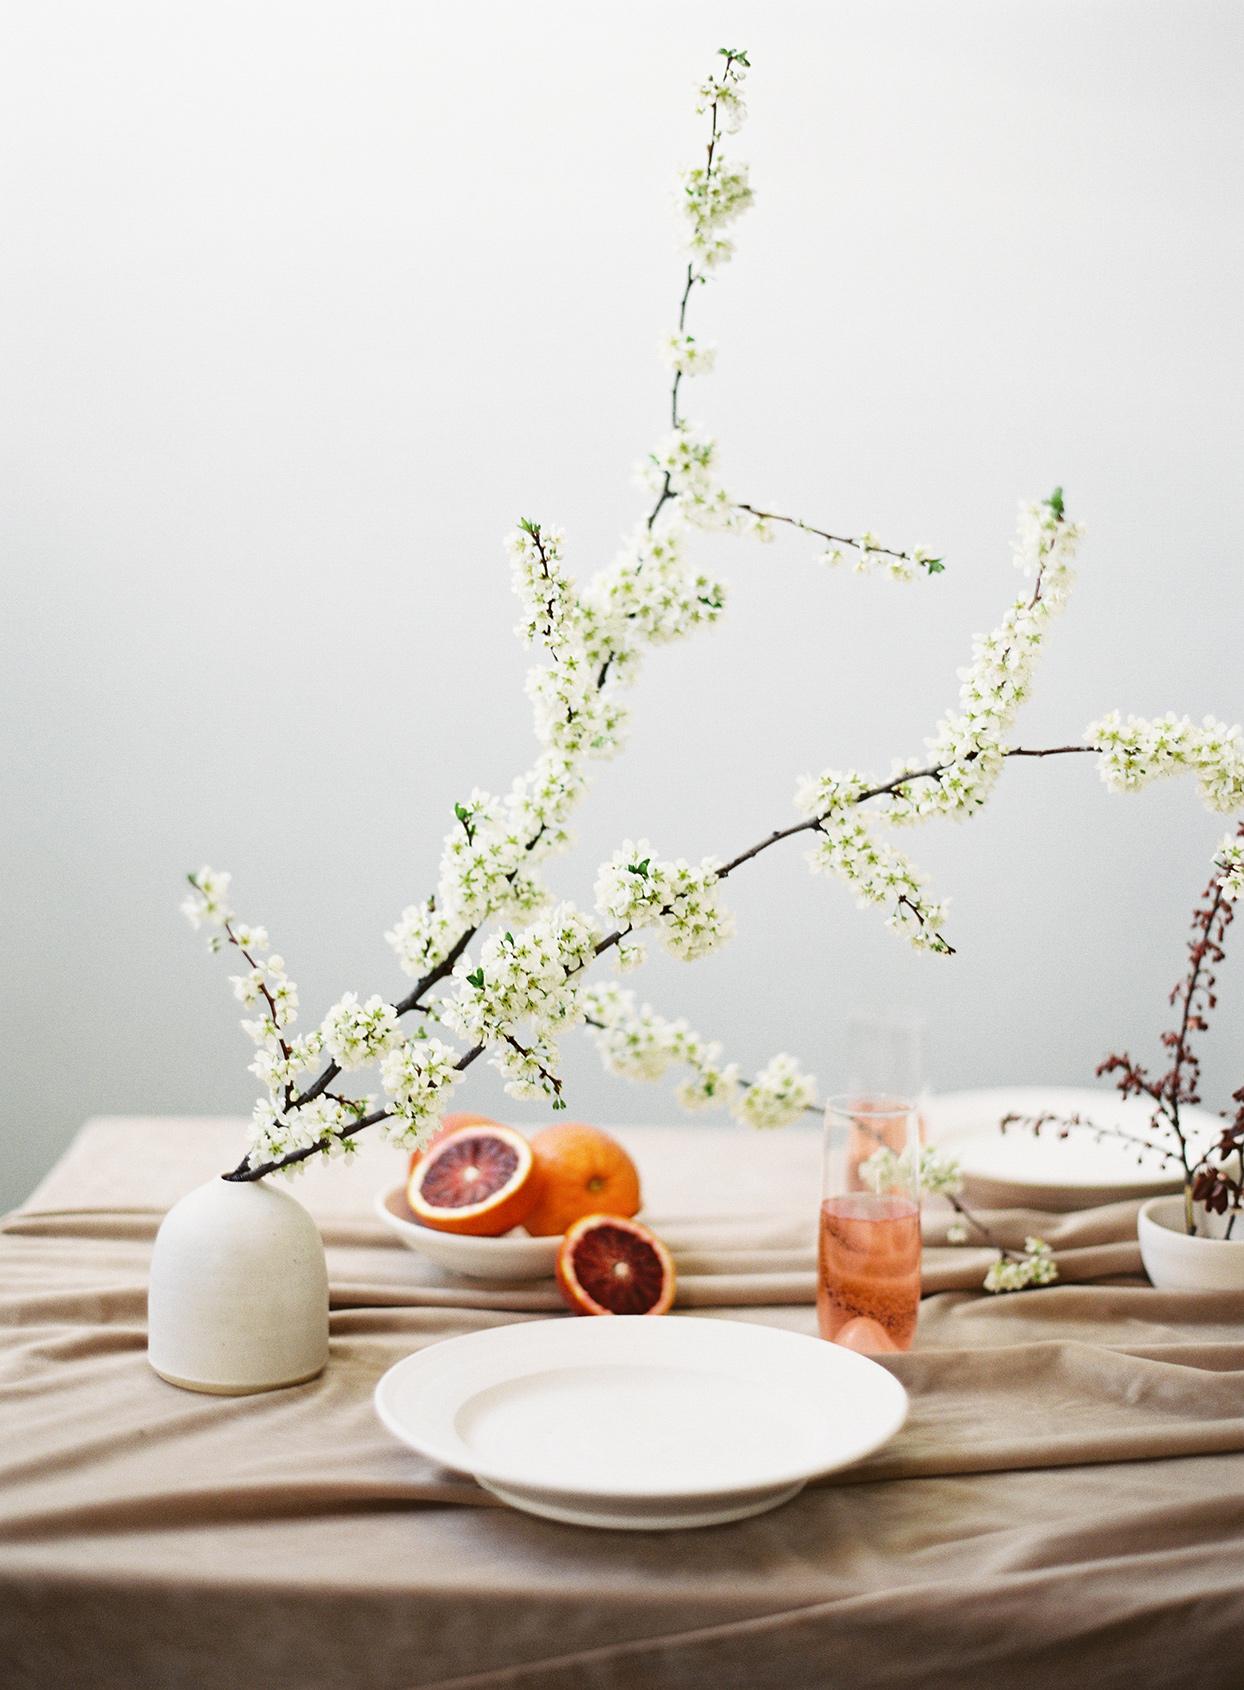 minimalist ikebana short vase with tall flowers on table with oranges